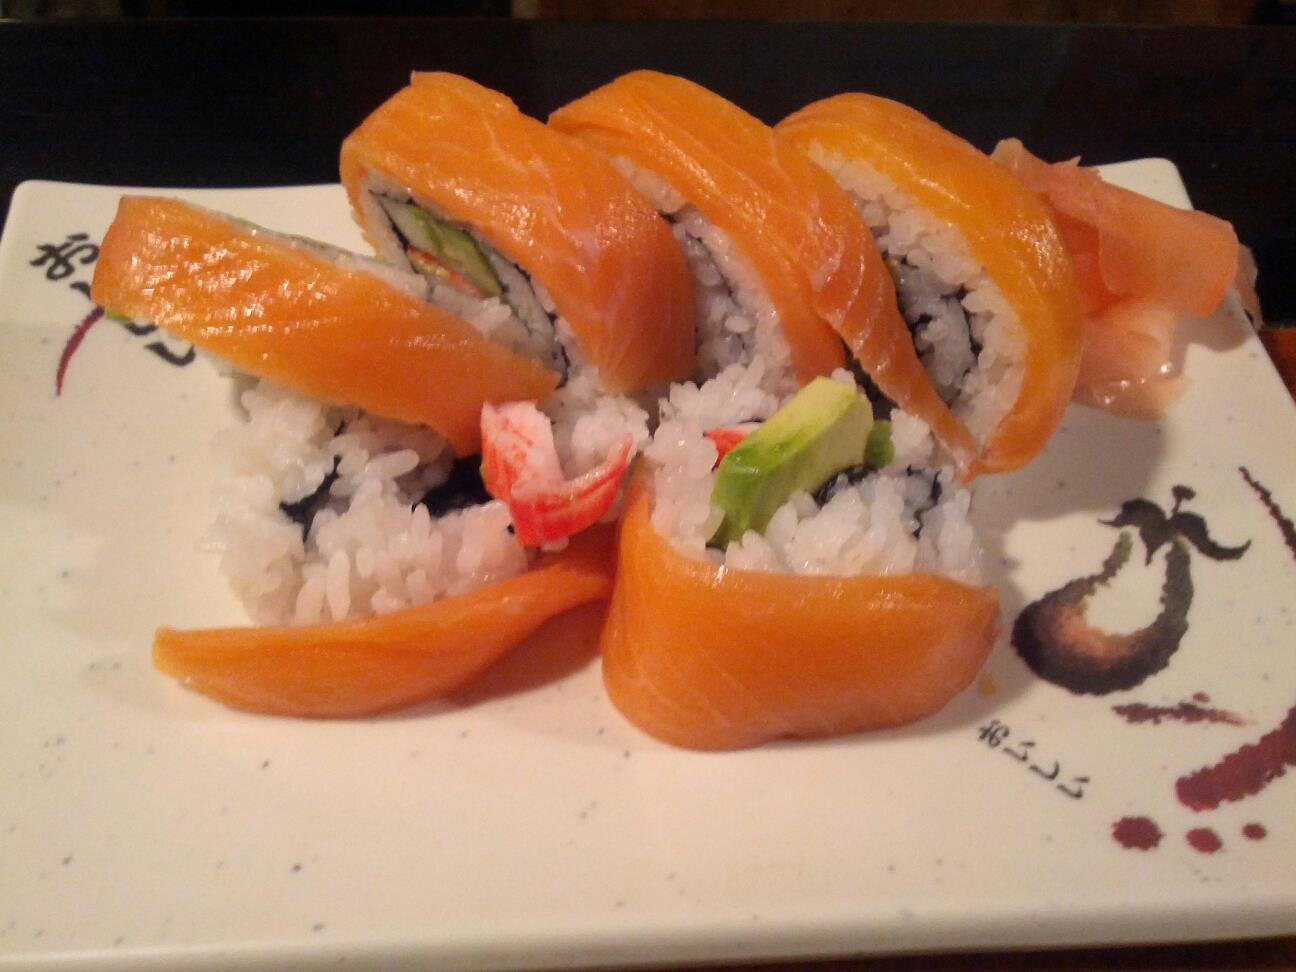 Shogun japanese restaurant in tucson az 520 888 6 - Shogun japanese cuisine ...